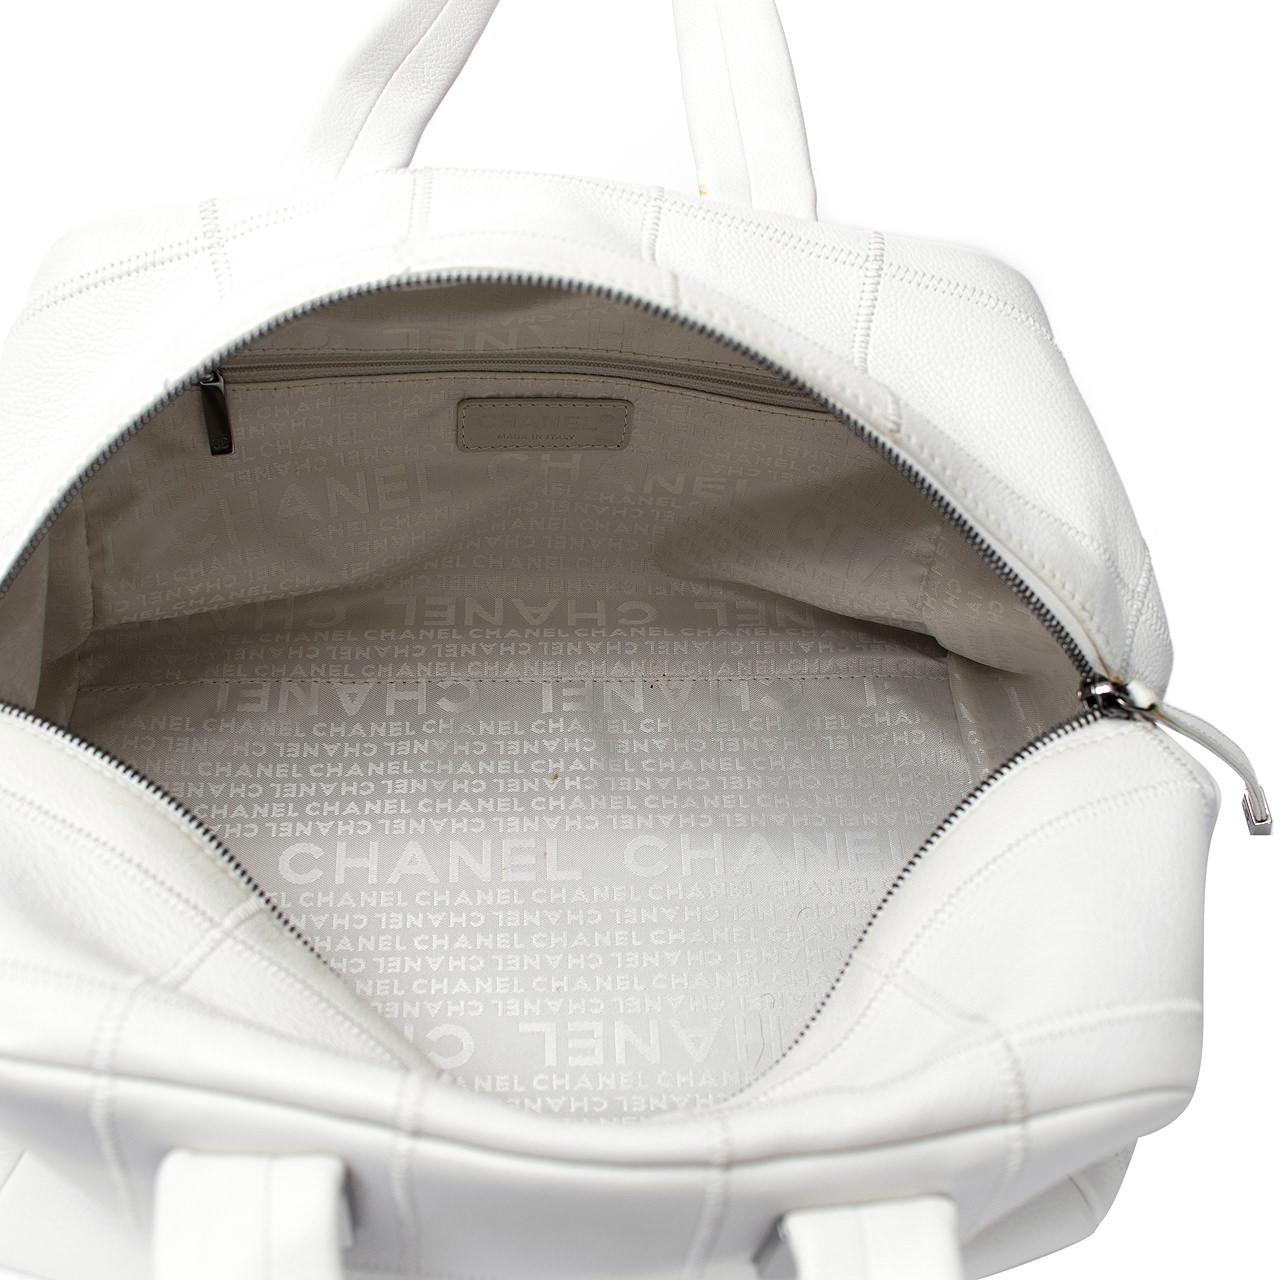 Bolsa De Mao Chanel : Bolsa chanel branca m?o box de grife